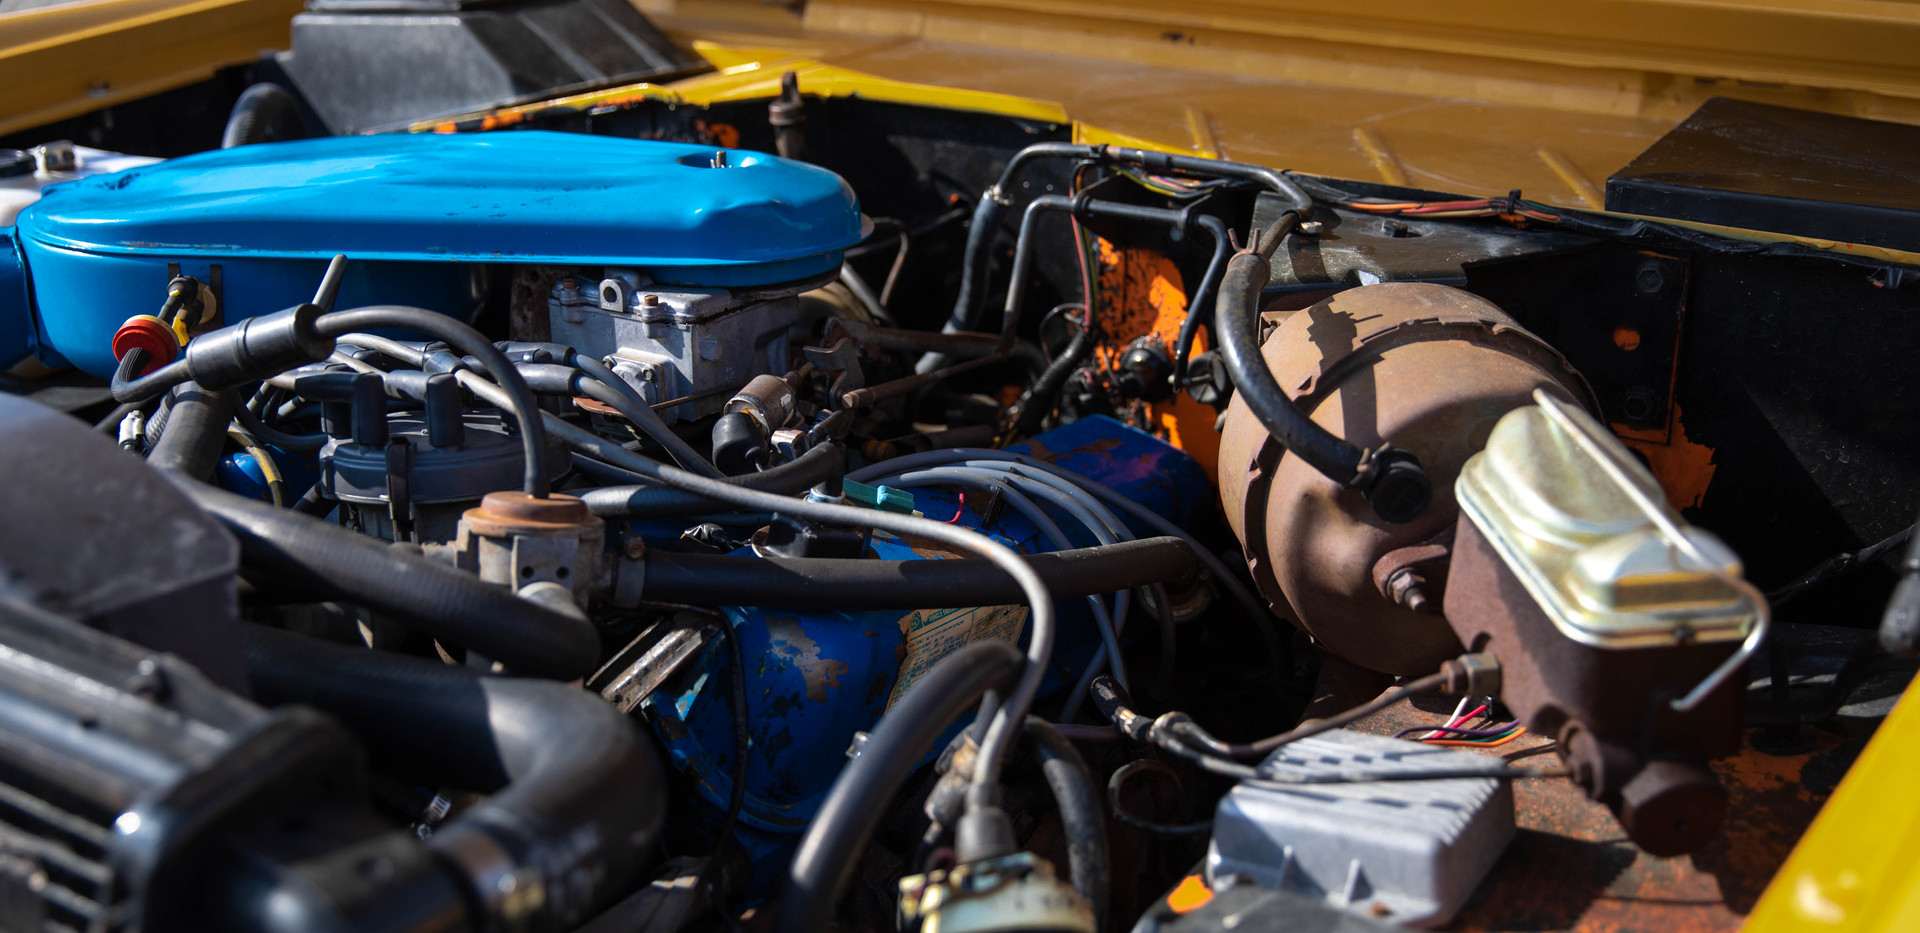 1977 Ford Bronco-19.jpg